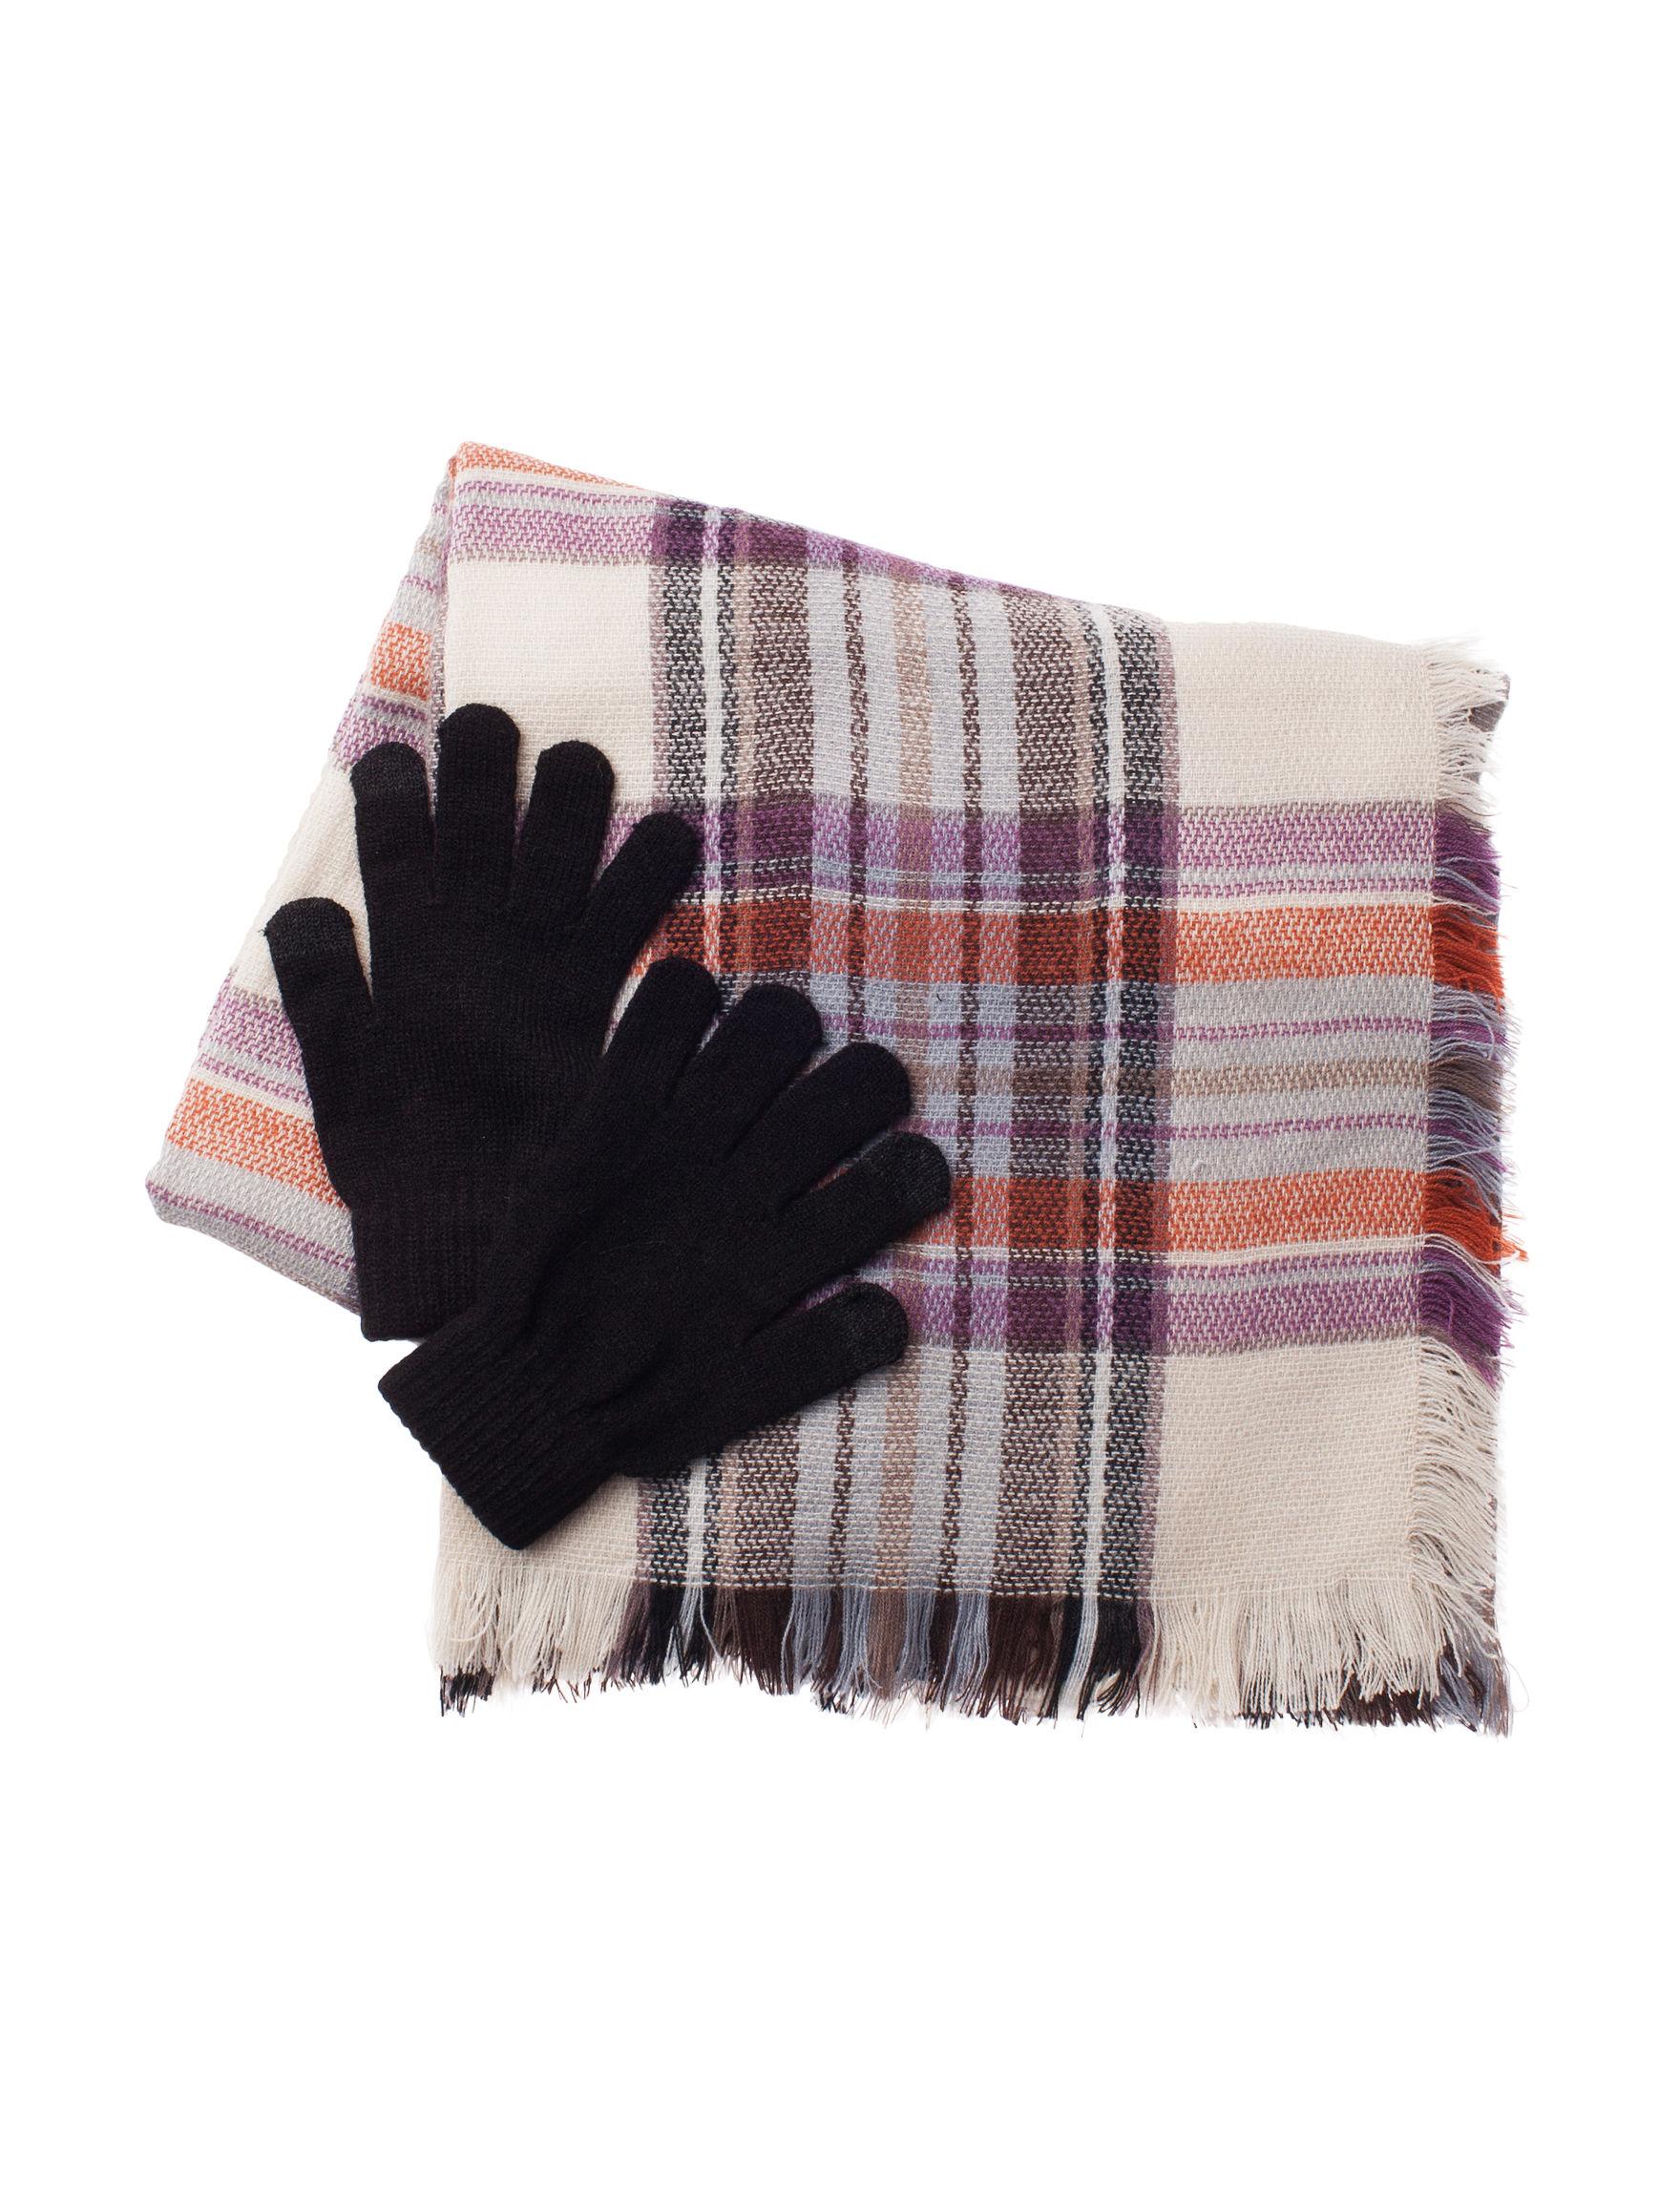 Steve Madden Beige / Multi Scarves & Wraps Scarves